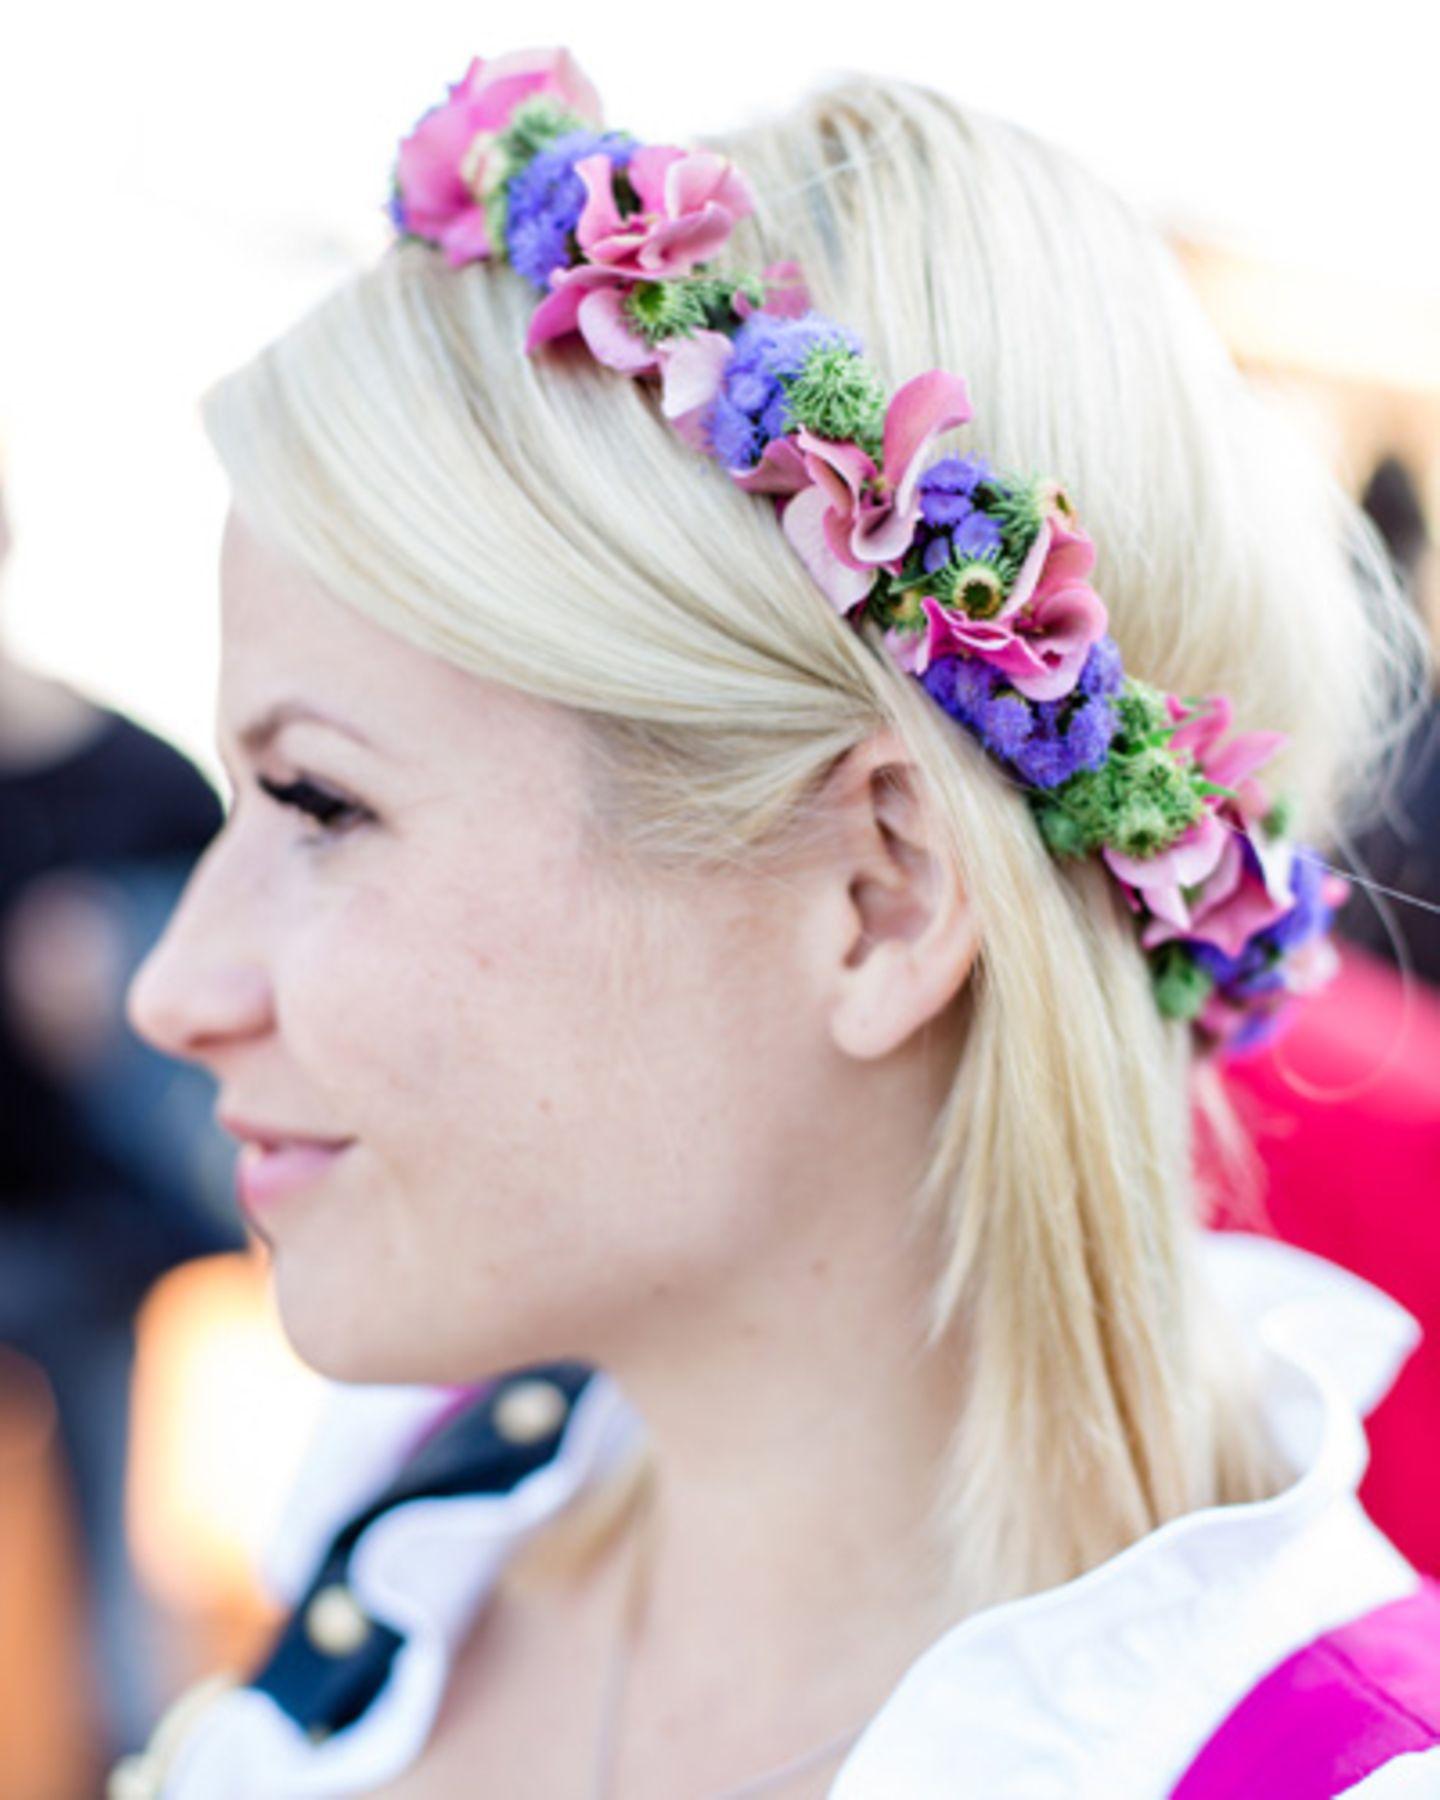 Streetstyle Wiesn: Outfits vom Oktoberfest